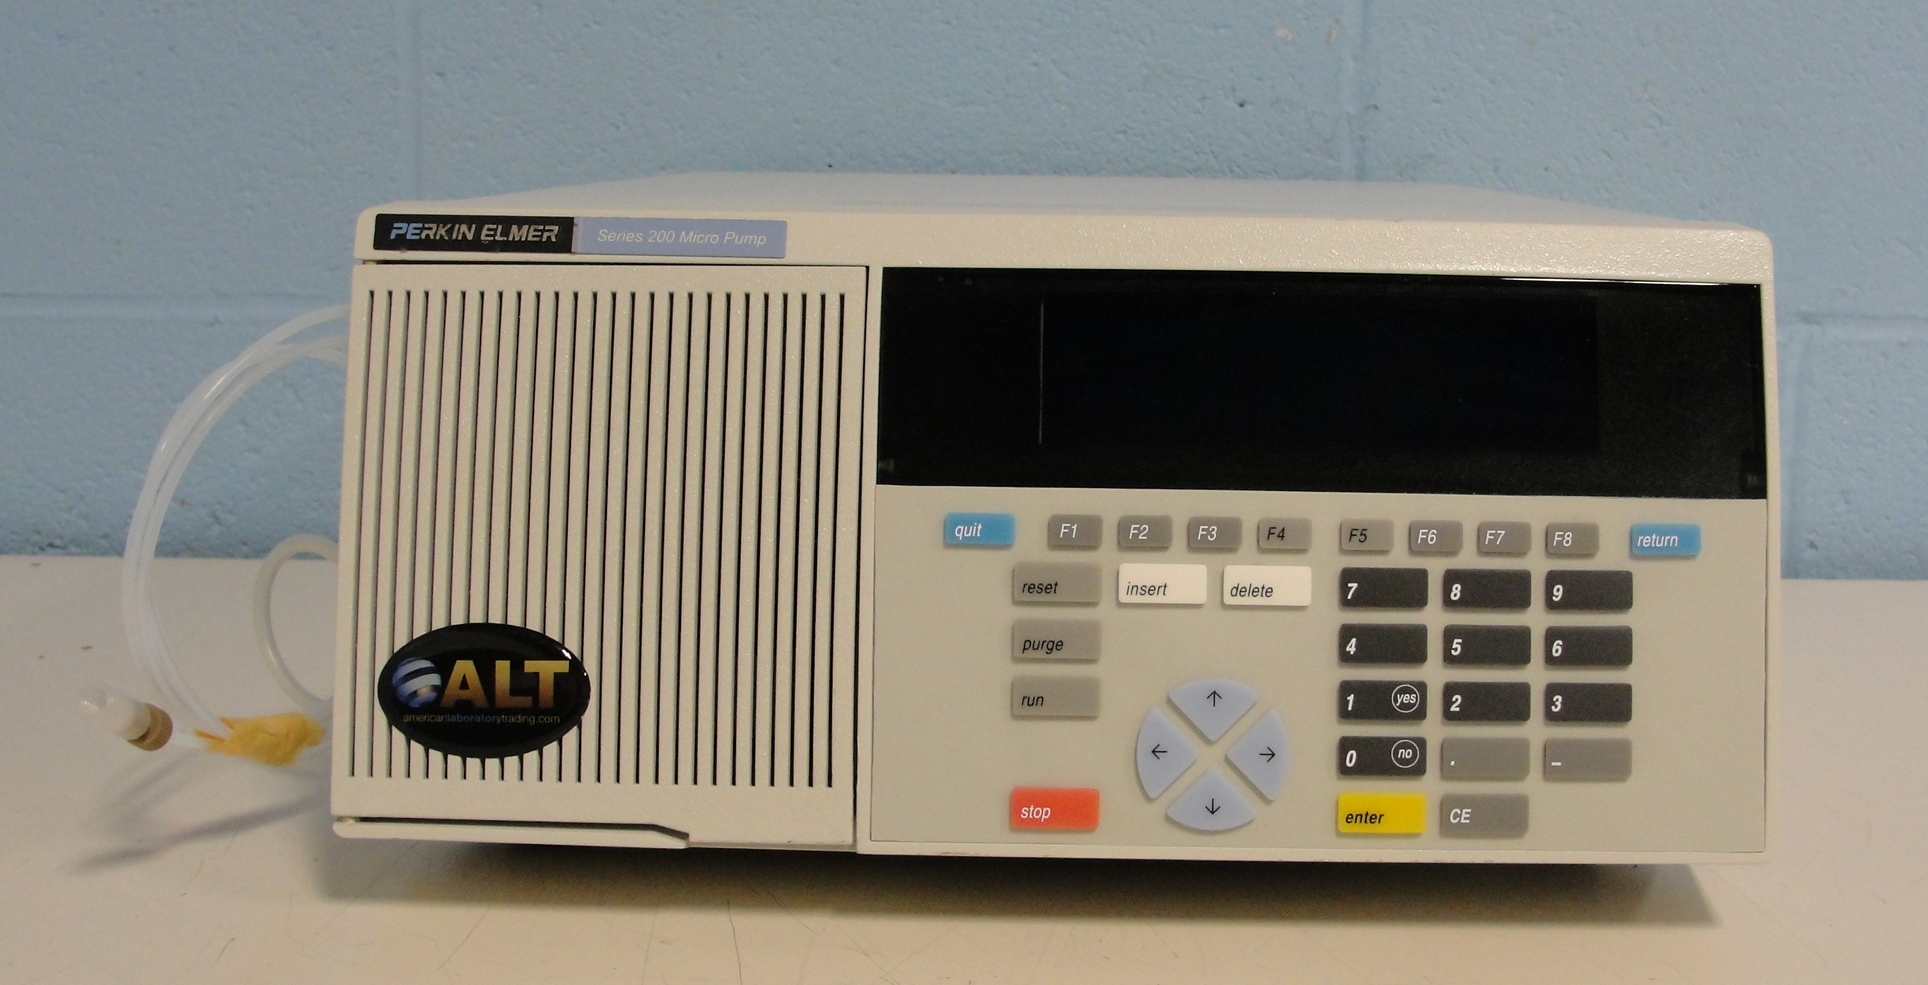 PerkinElmer Series 200 Micro Pump Image